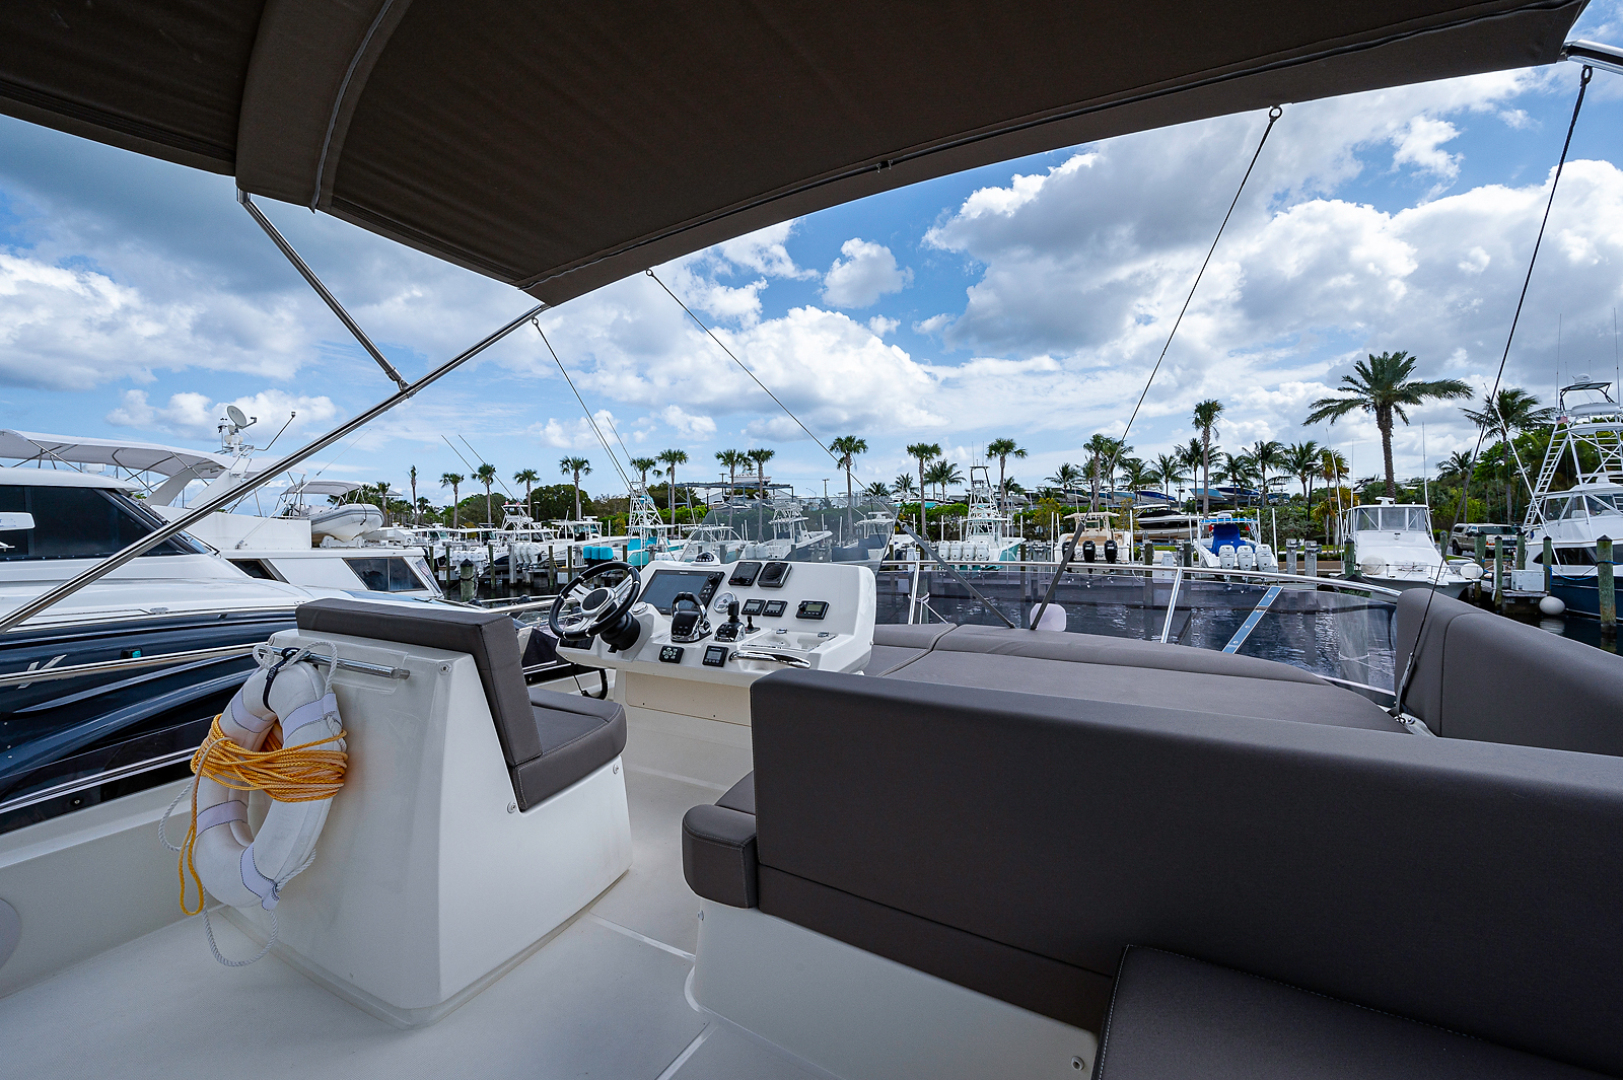 Prestige-460 Flybridge 2018-SEAQUEL Palm Beach Gardens-Florida-United States-Flybridge-1351140 | Thumbnail